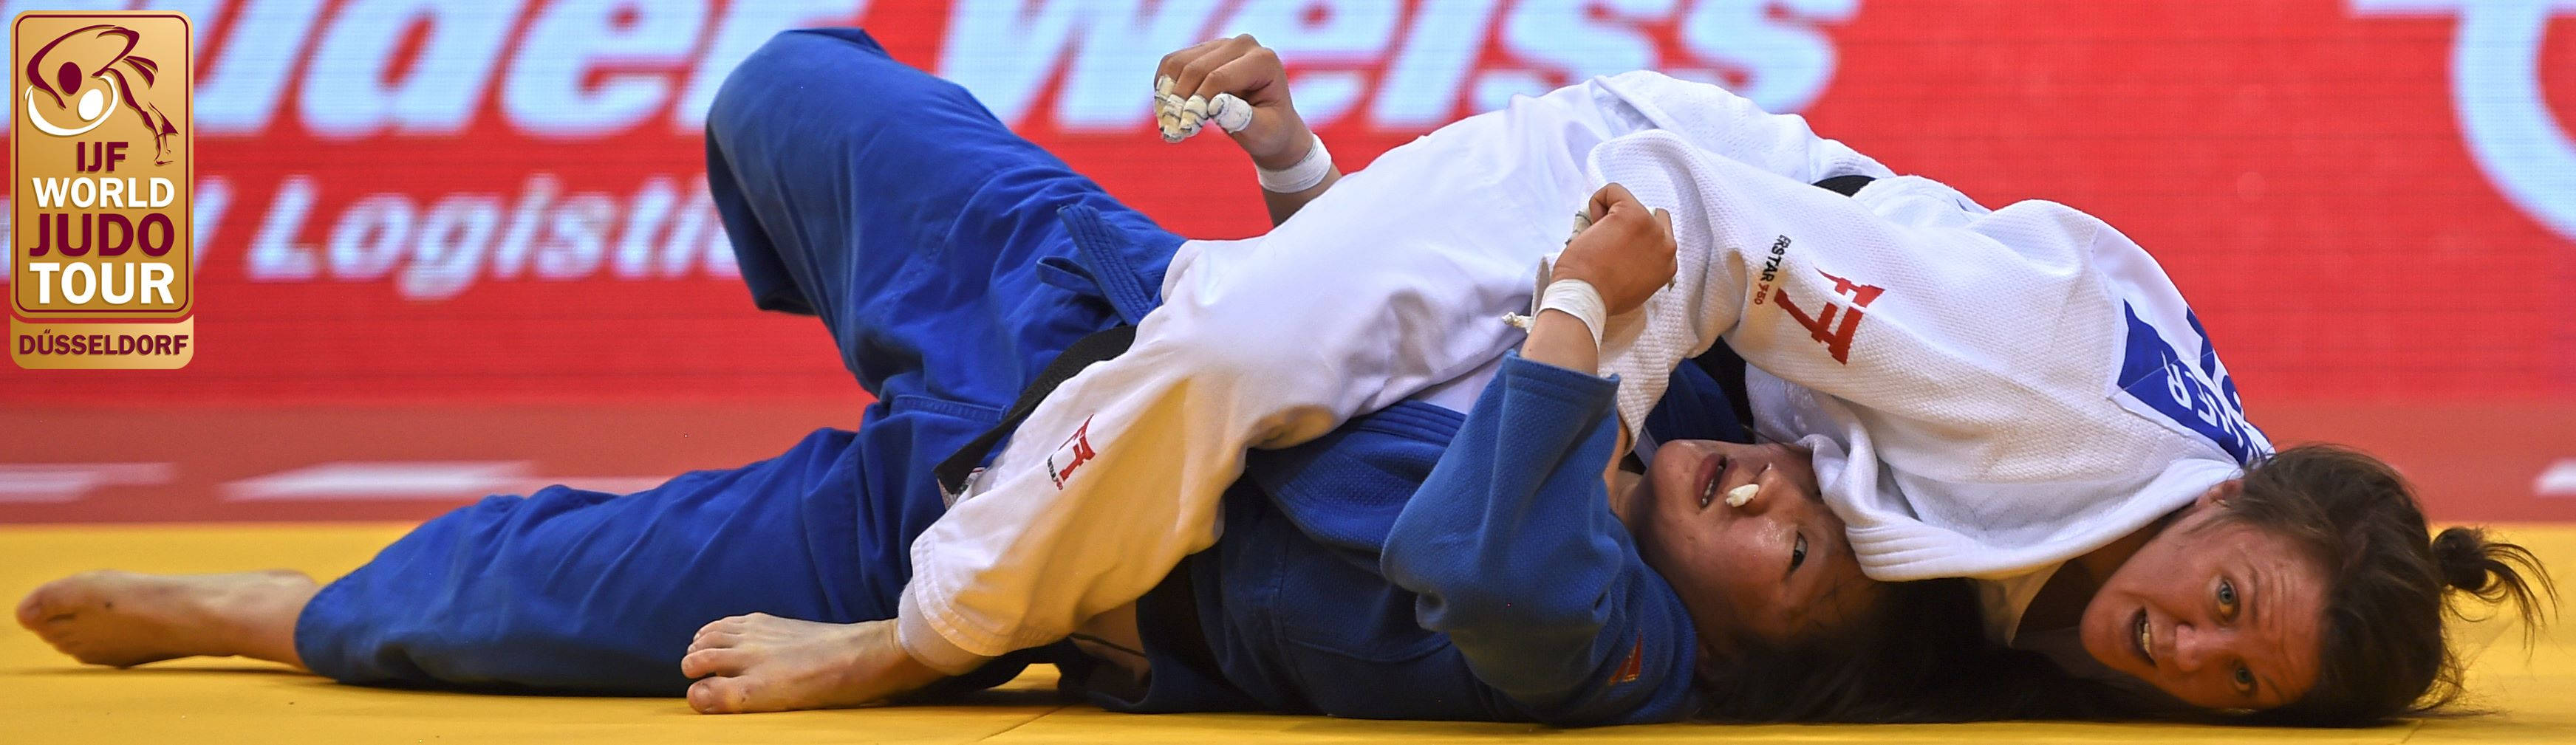 megan fletcher  judoka  judoinside